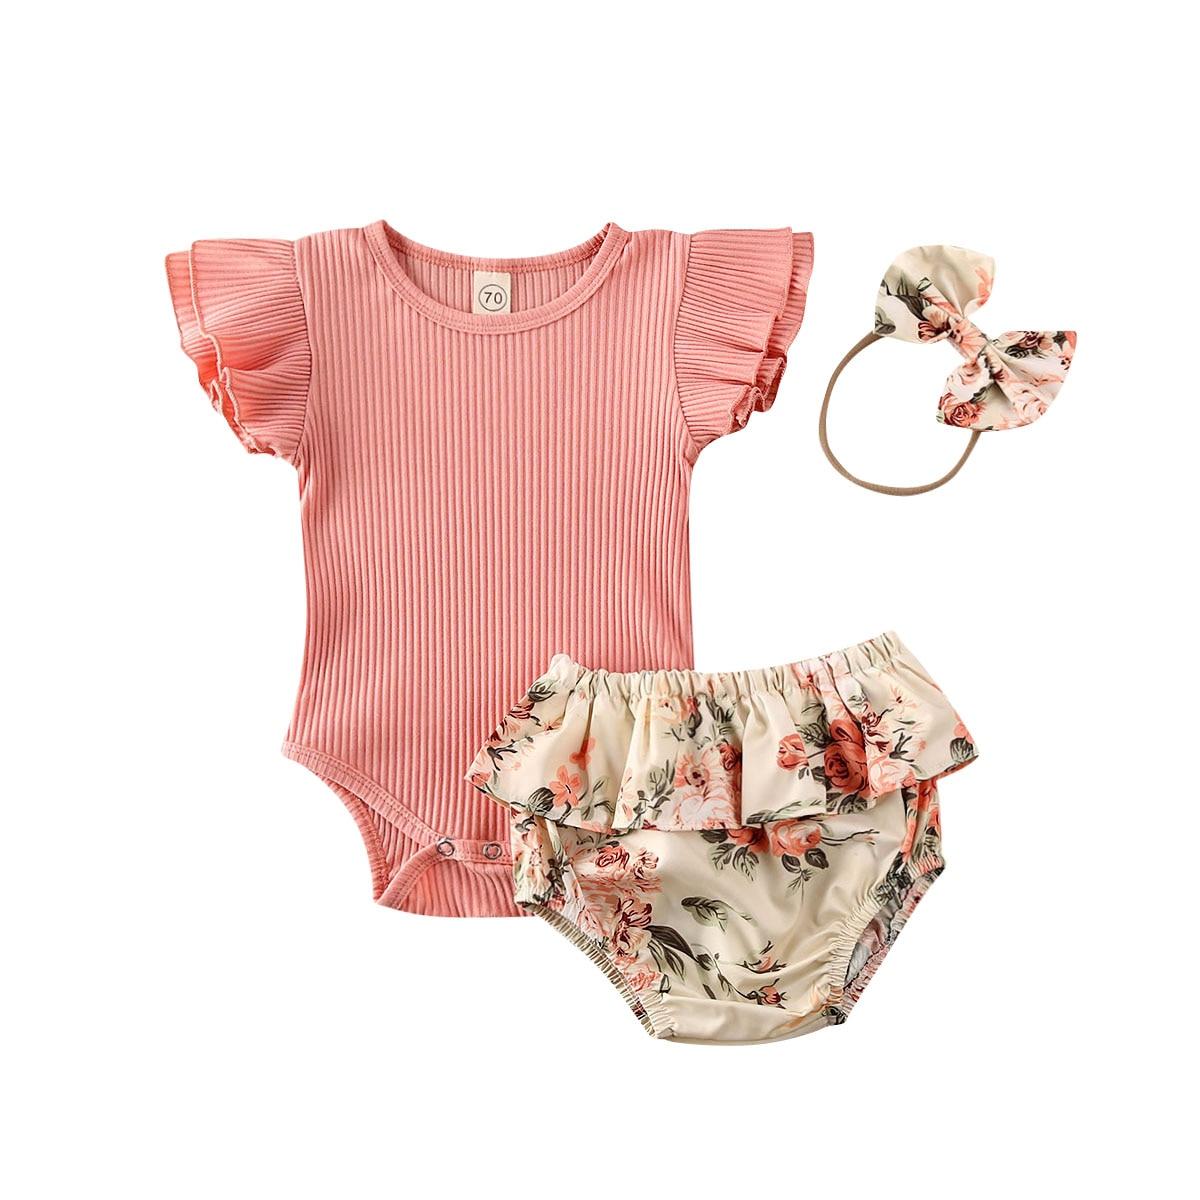 3PCS Infant Baby Girl Leopard Outfits Flying Sleeve Romper Bodysuit+Harem Pants+Headband Clothes Set